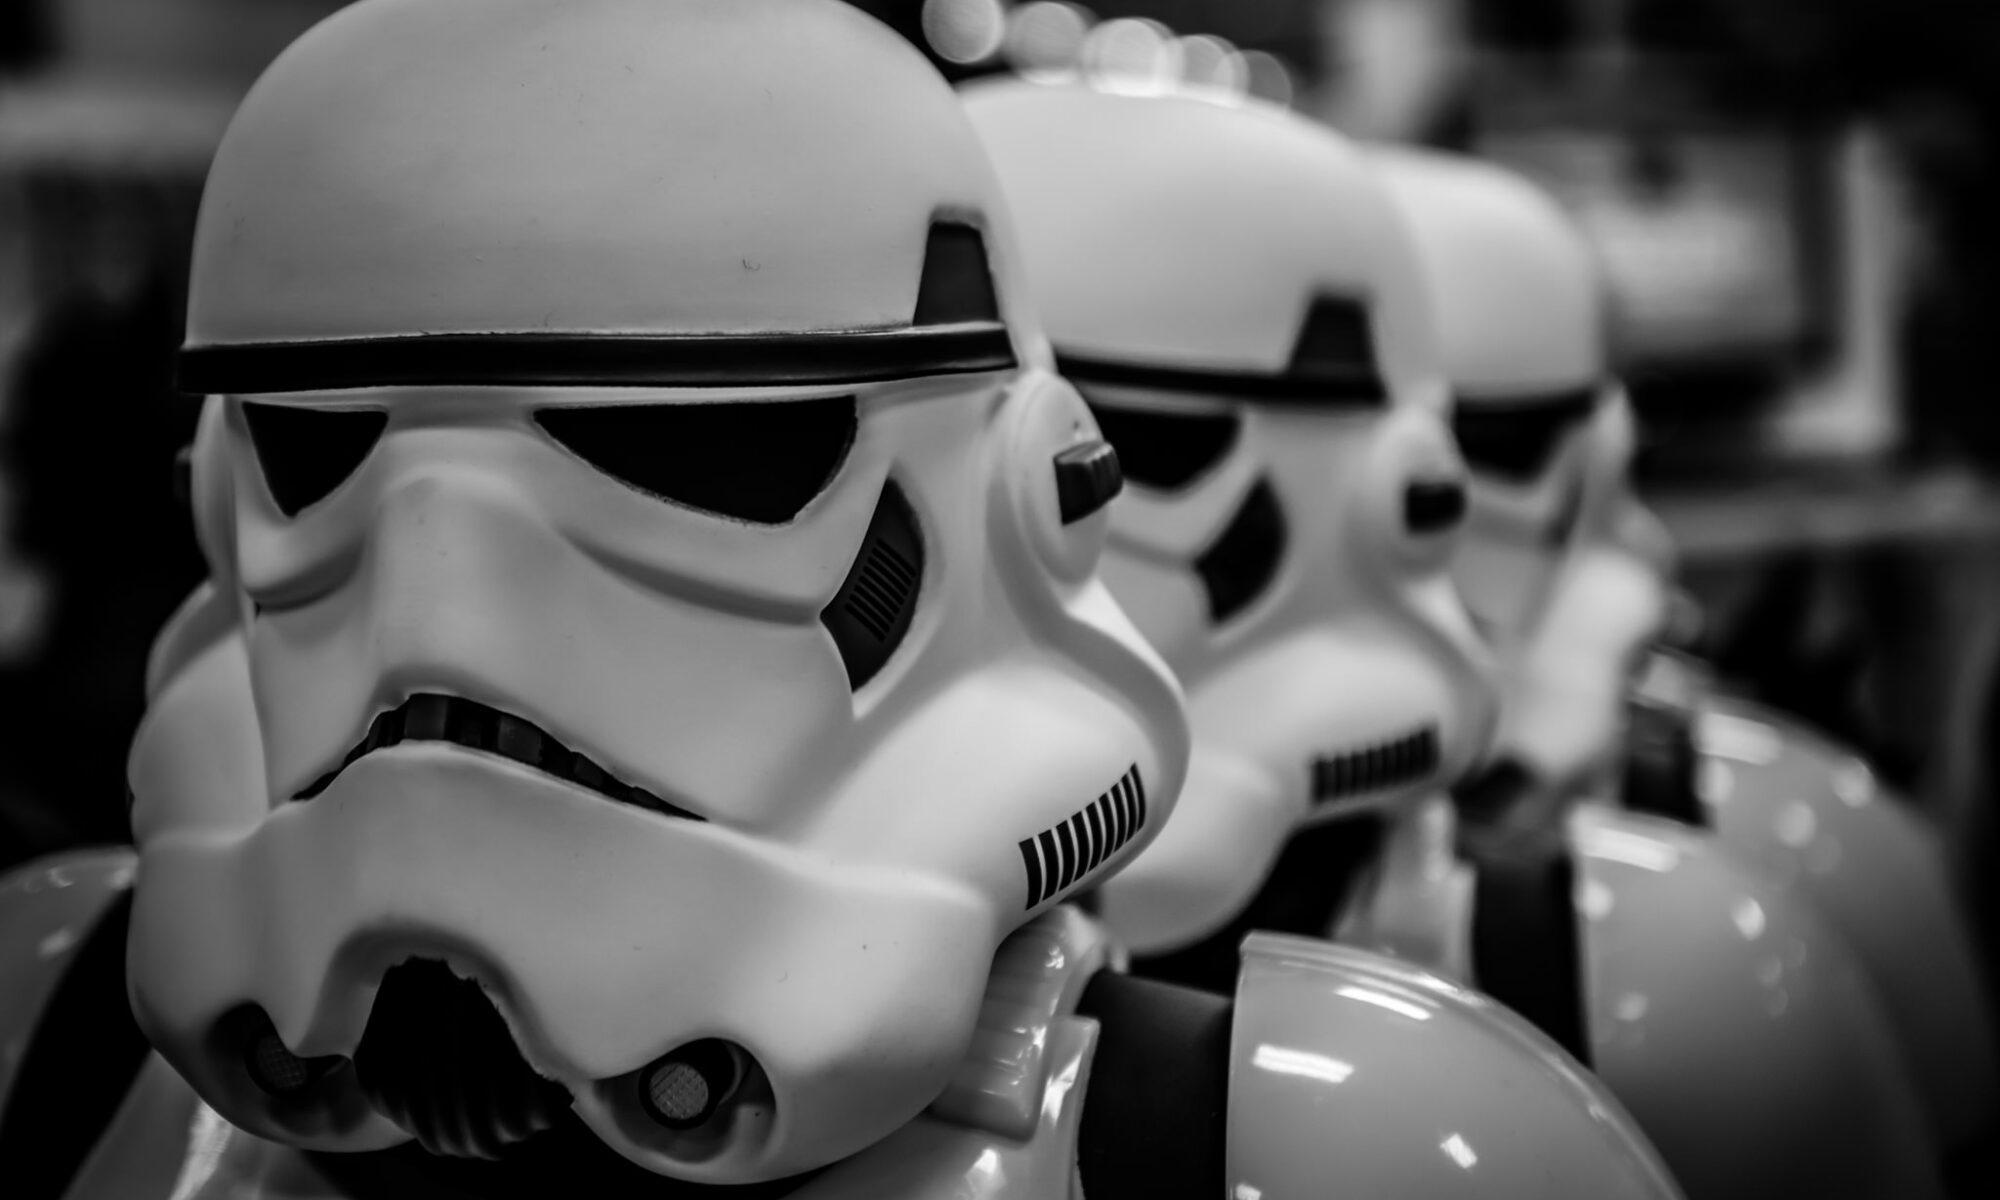 storm trooper photo